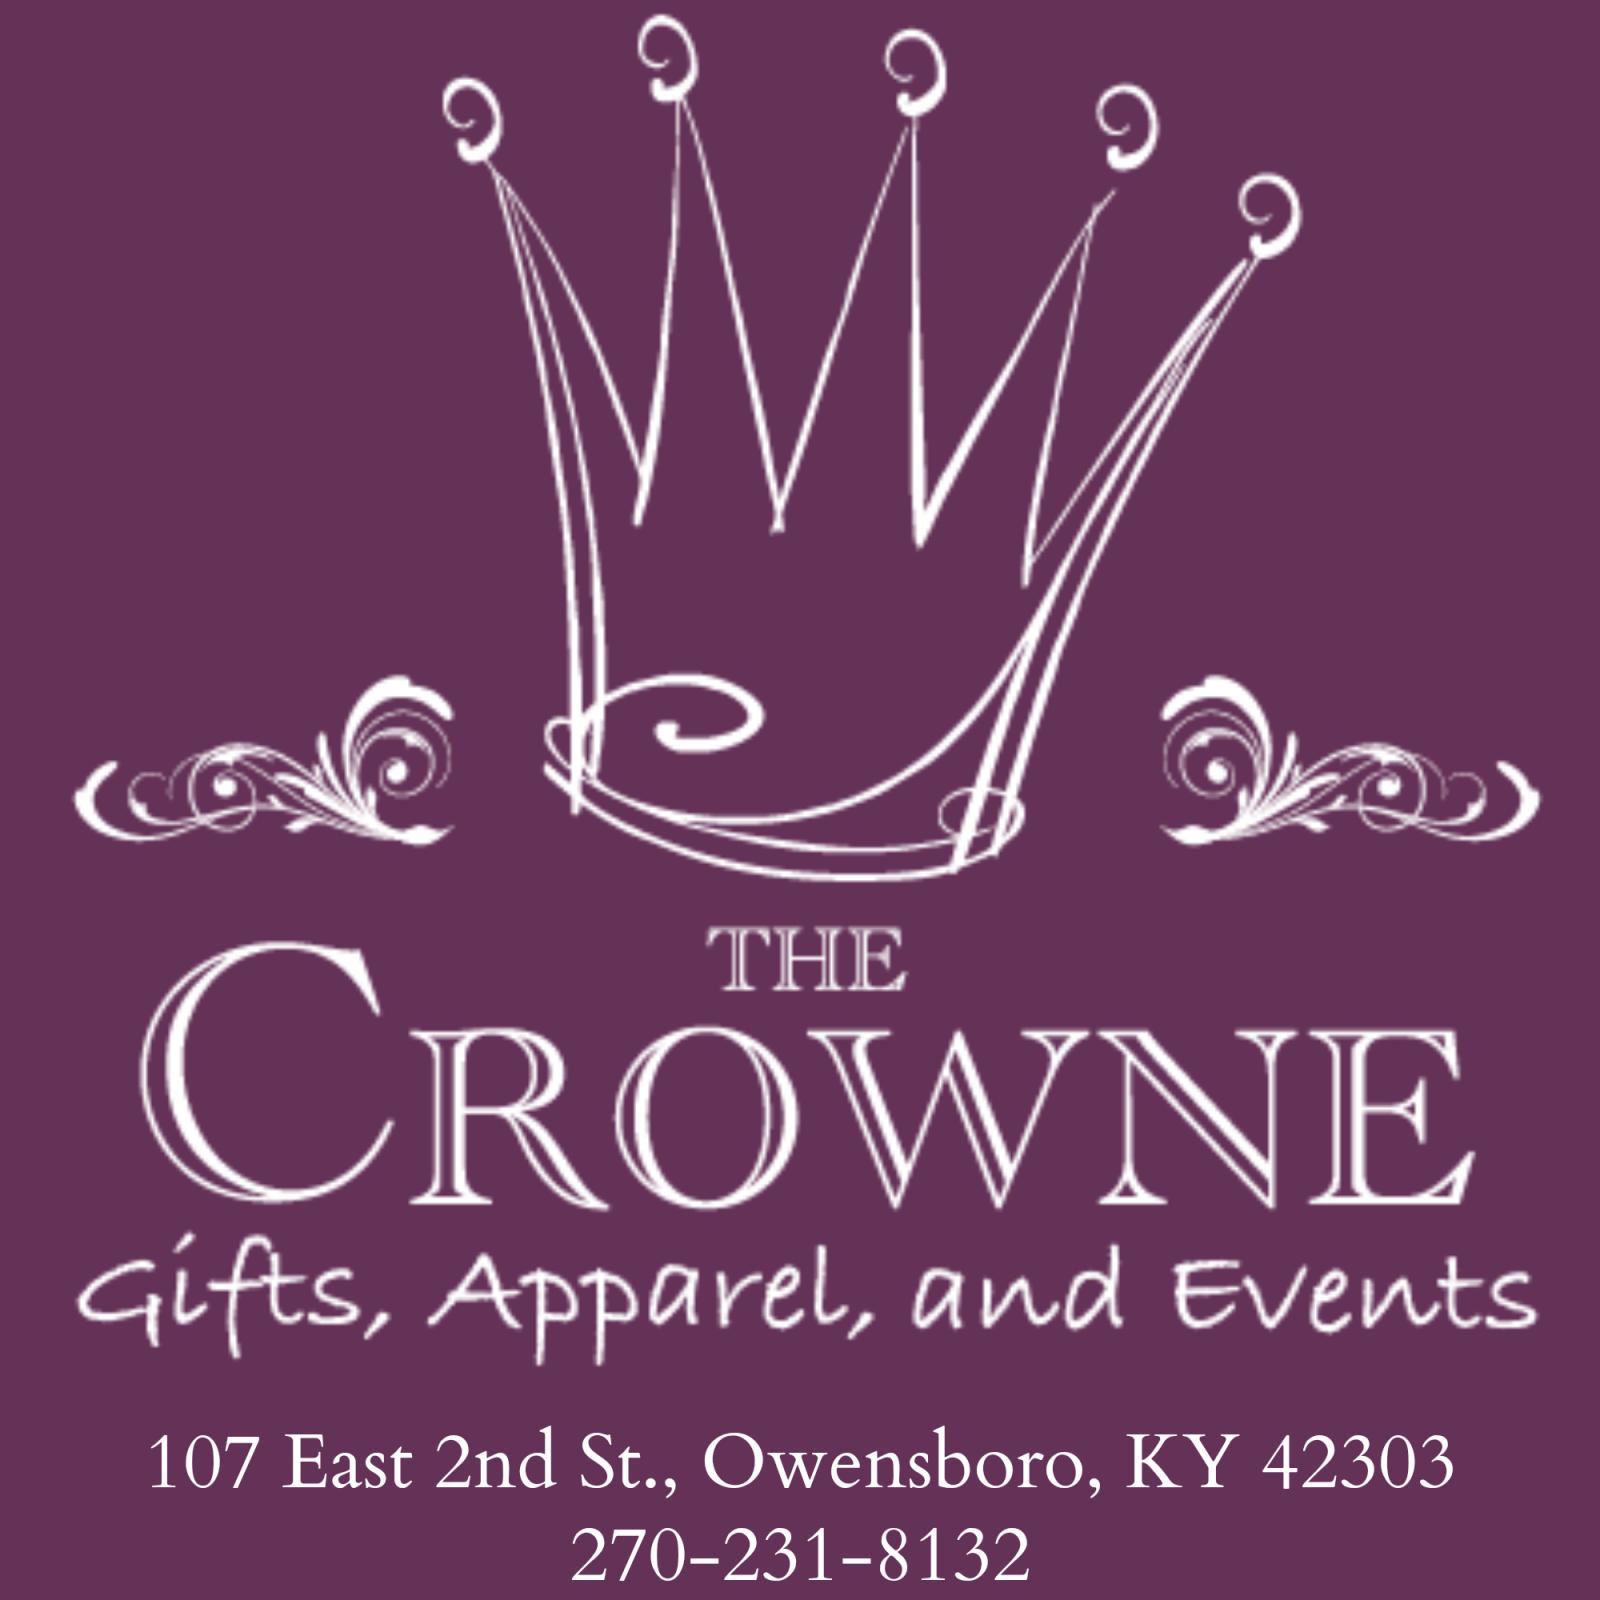 The Crowne